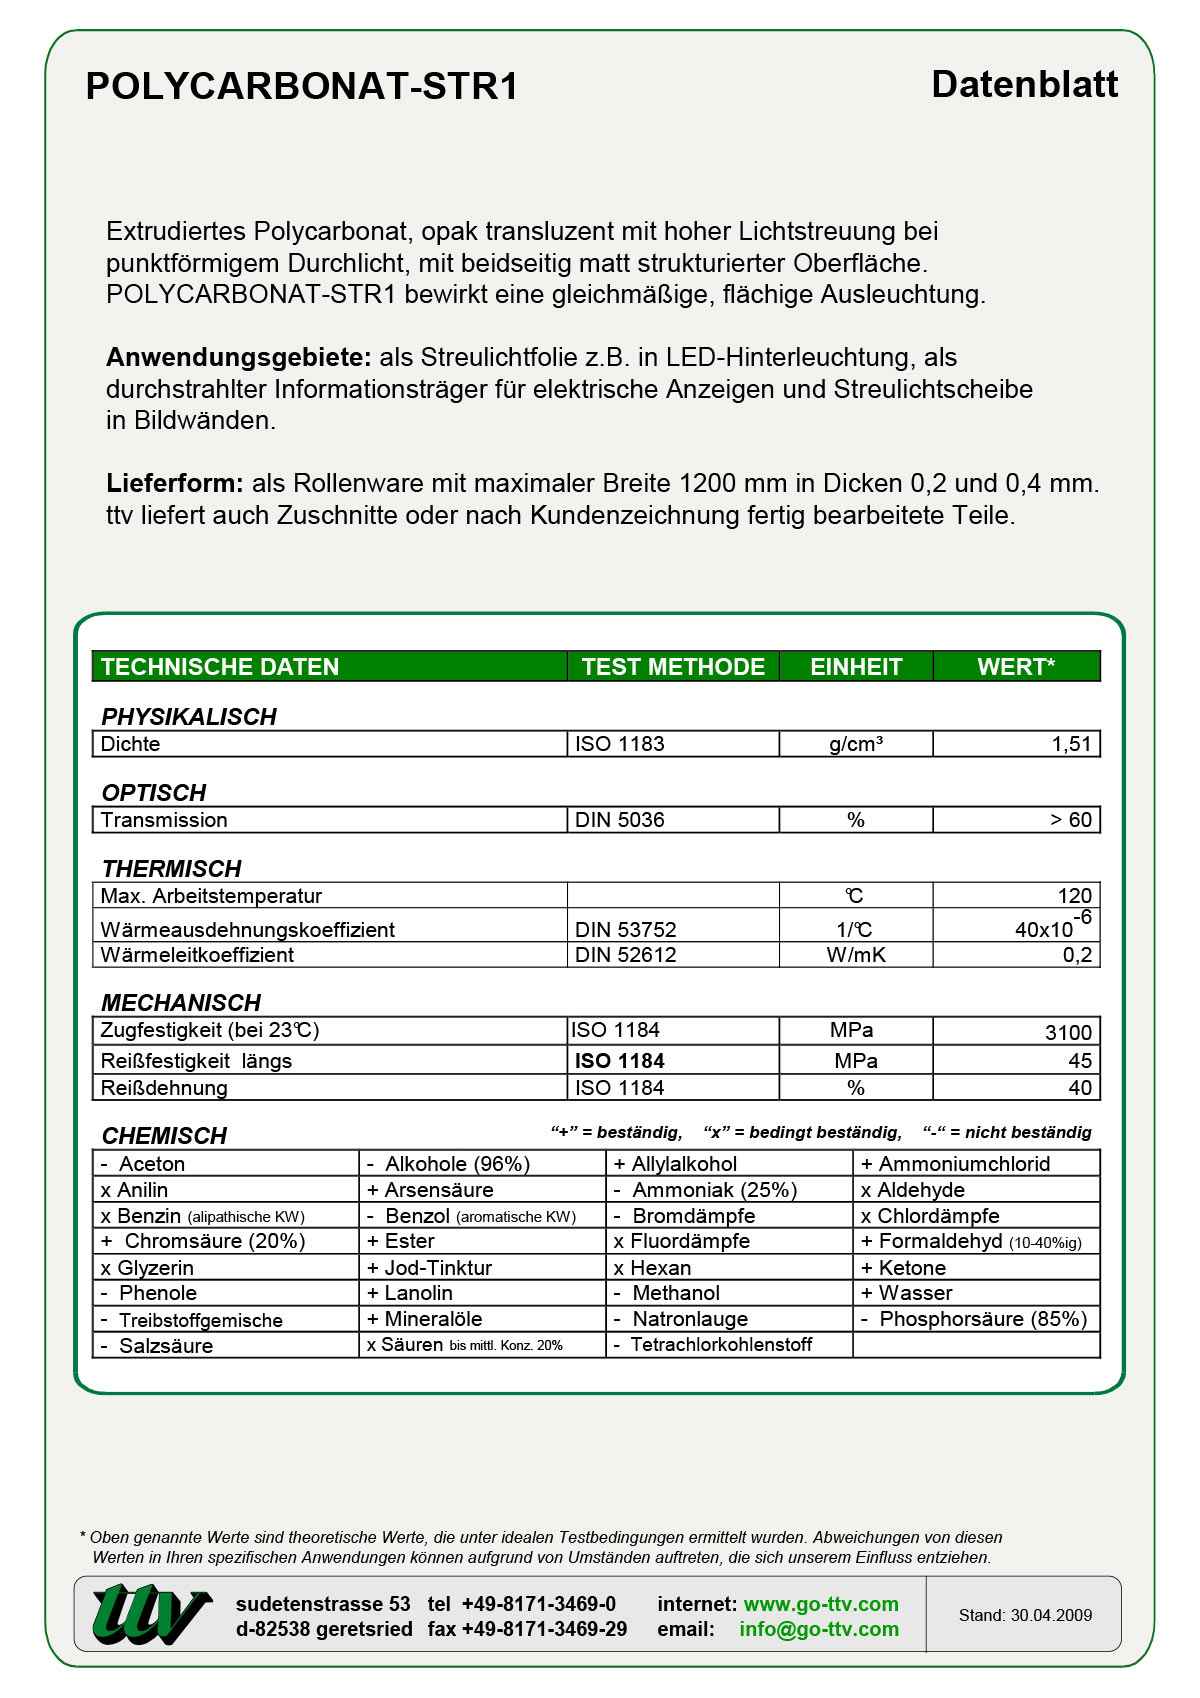 Polycarbonat-STR1 Datenblatt